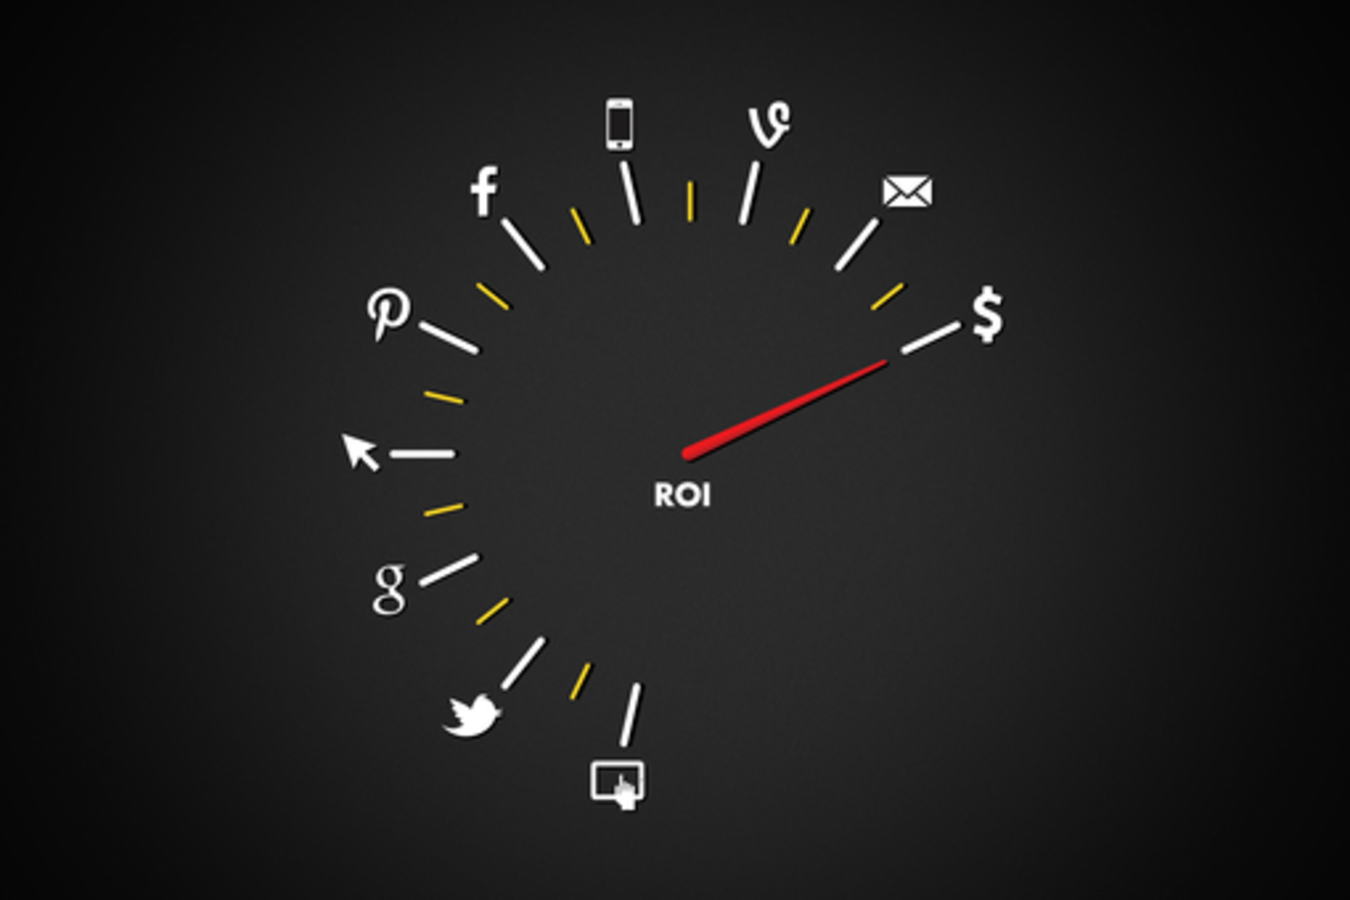 Measuring ROI in Digital Marketing